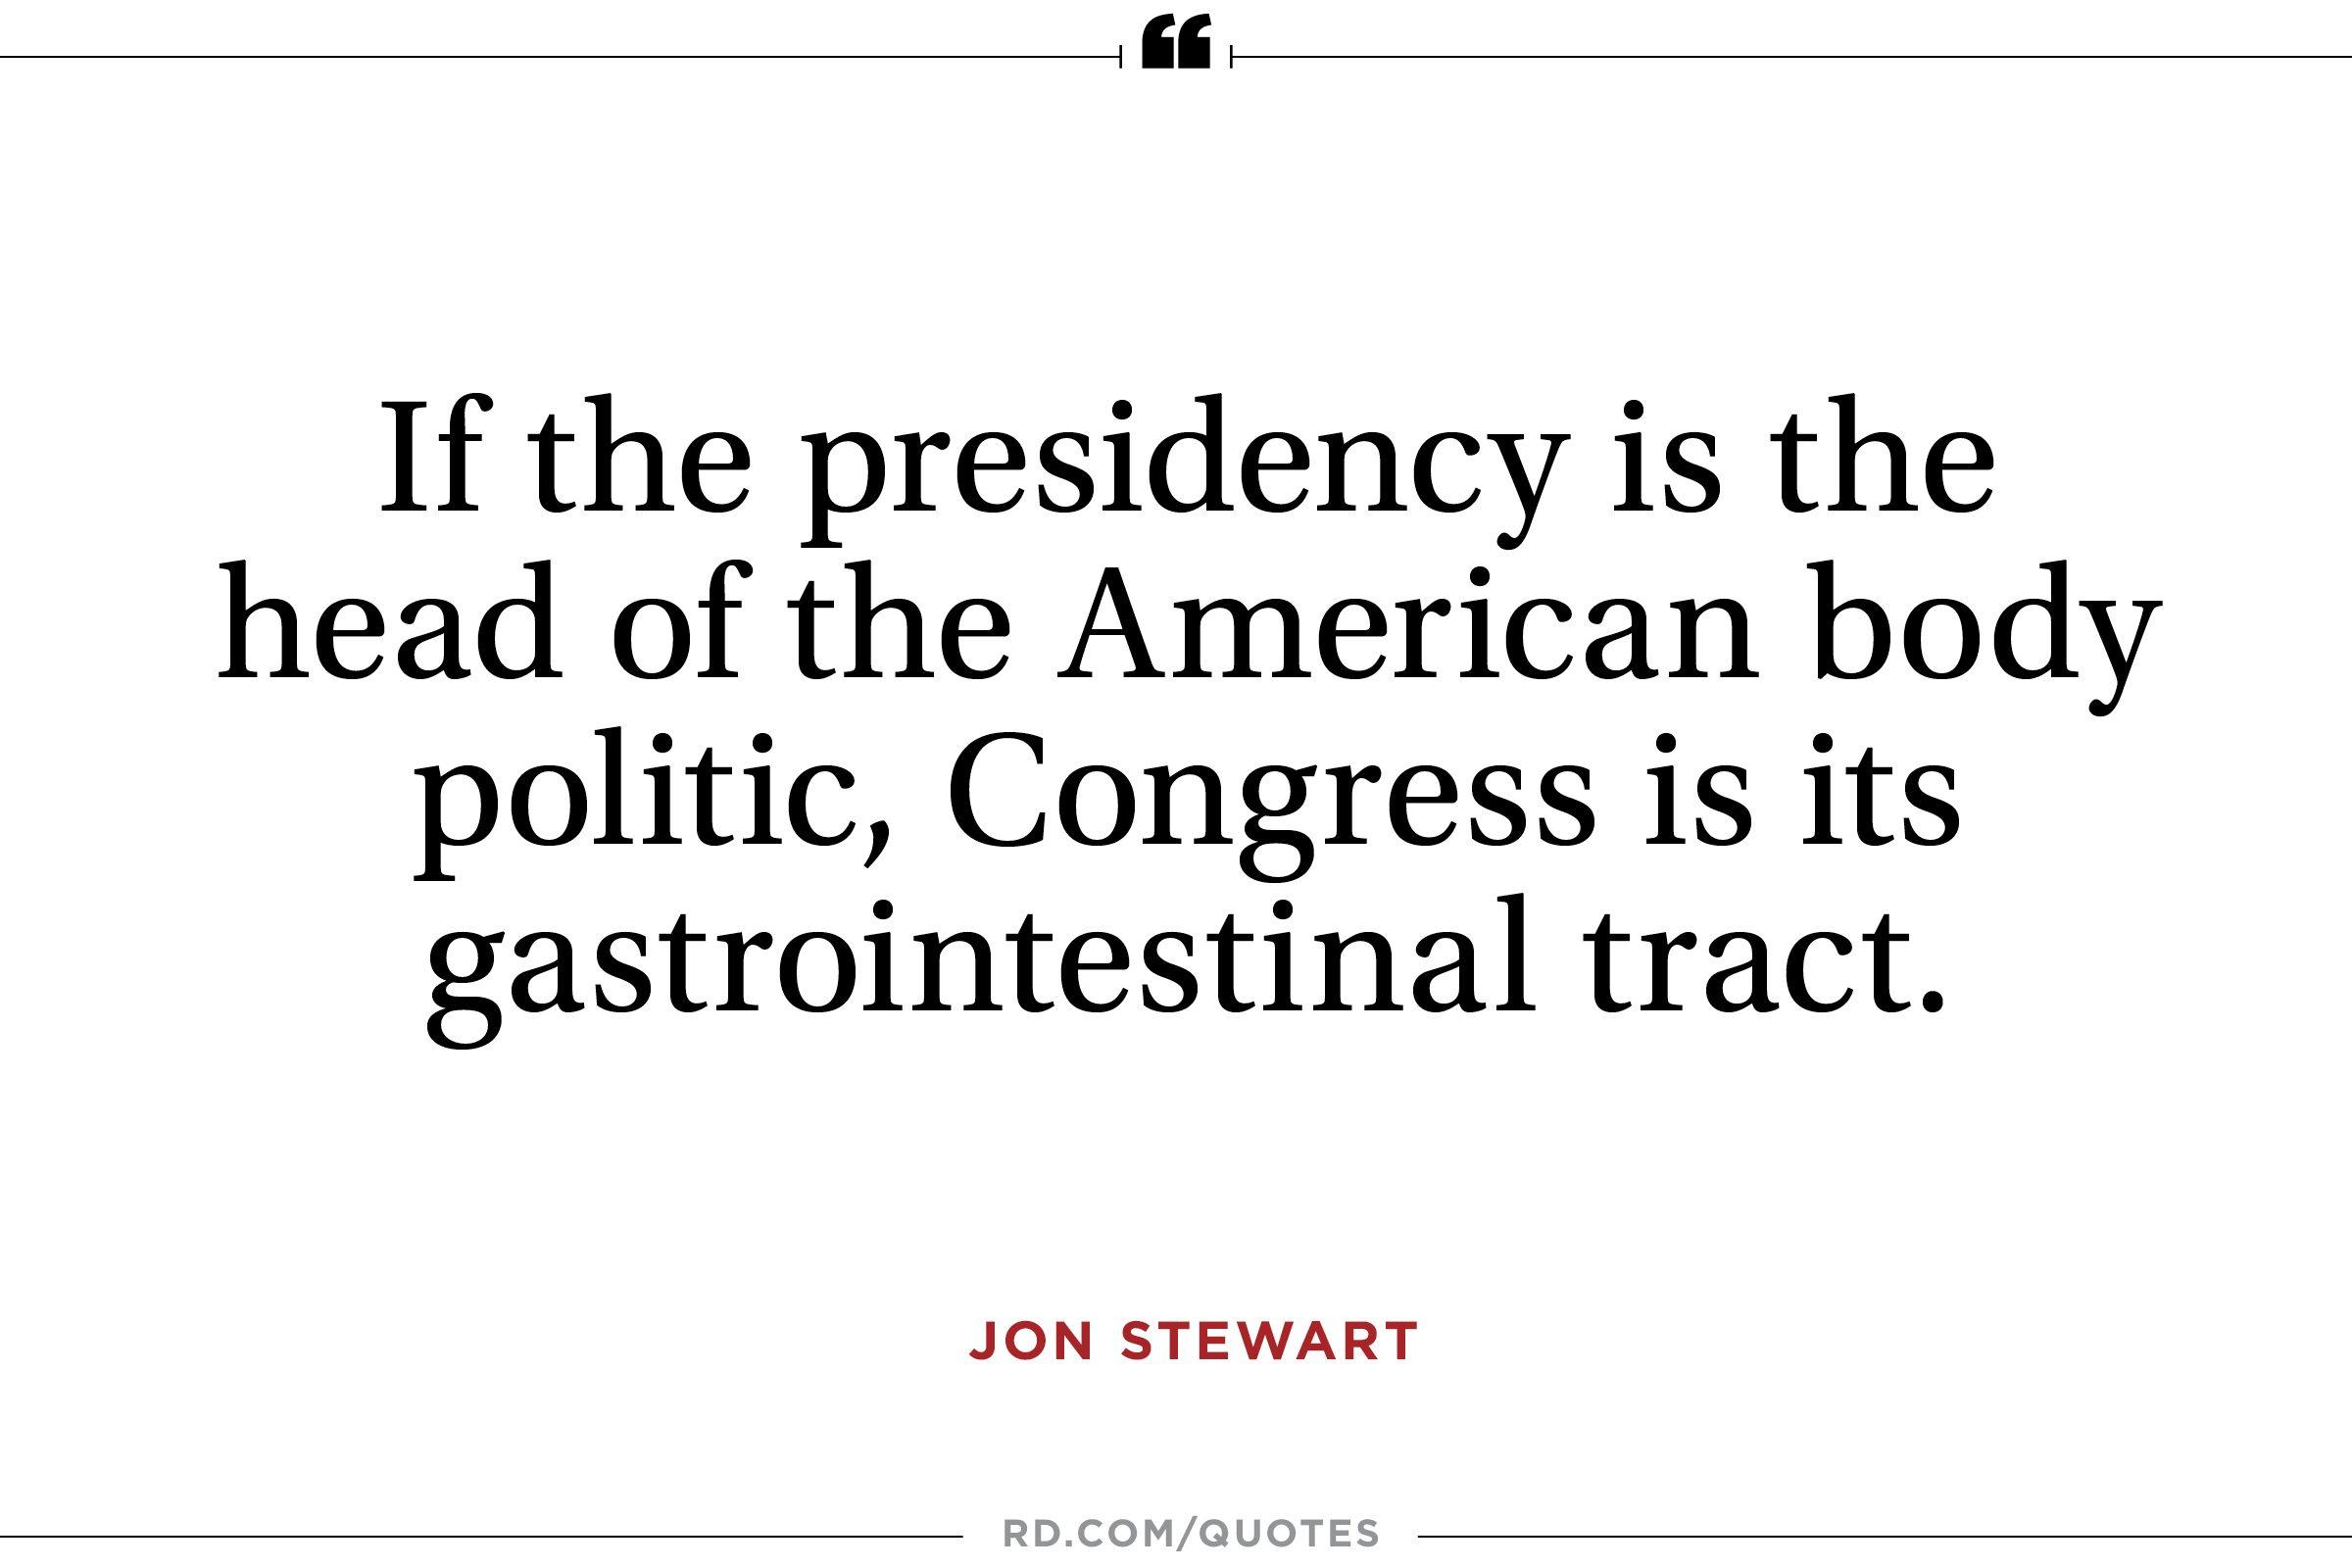 Jon Stewart on Congress